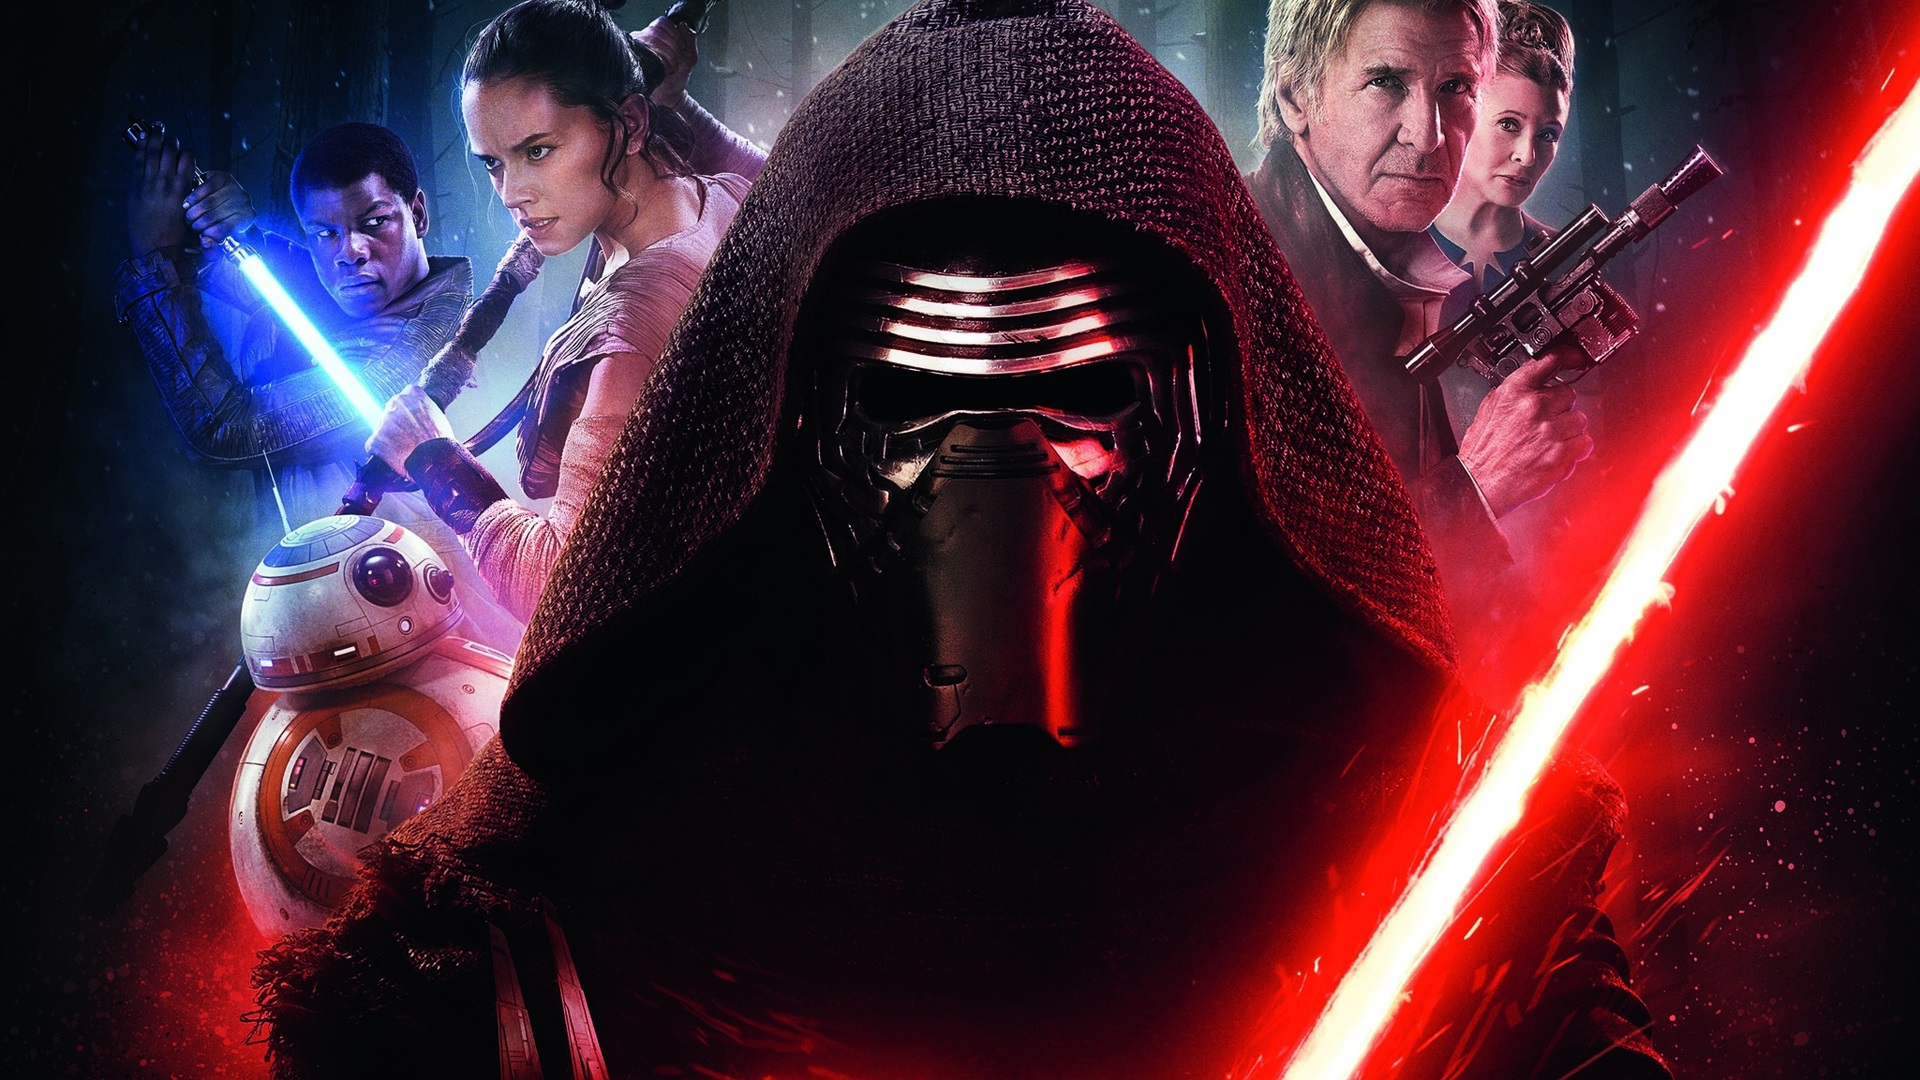 Wallpaper 2016 Movie Star Wars Episode Vii The Force Awakens